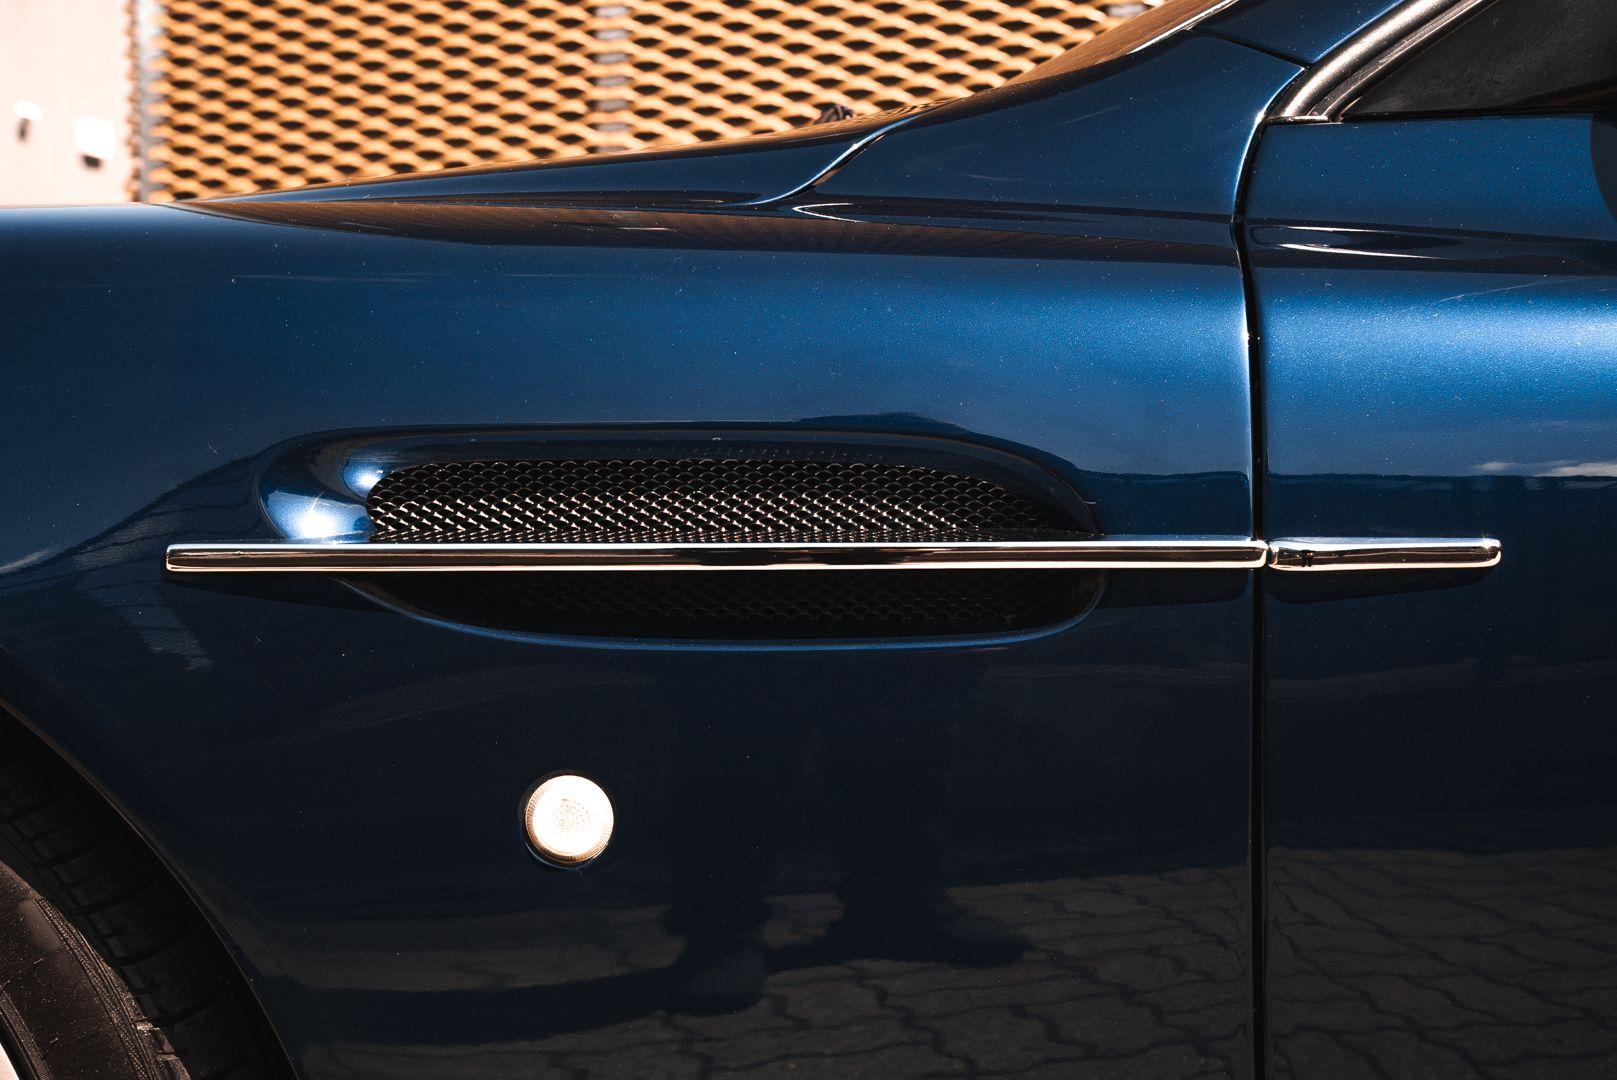 2001 Aston Martin V12 Vanquish 67930